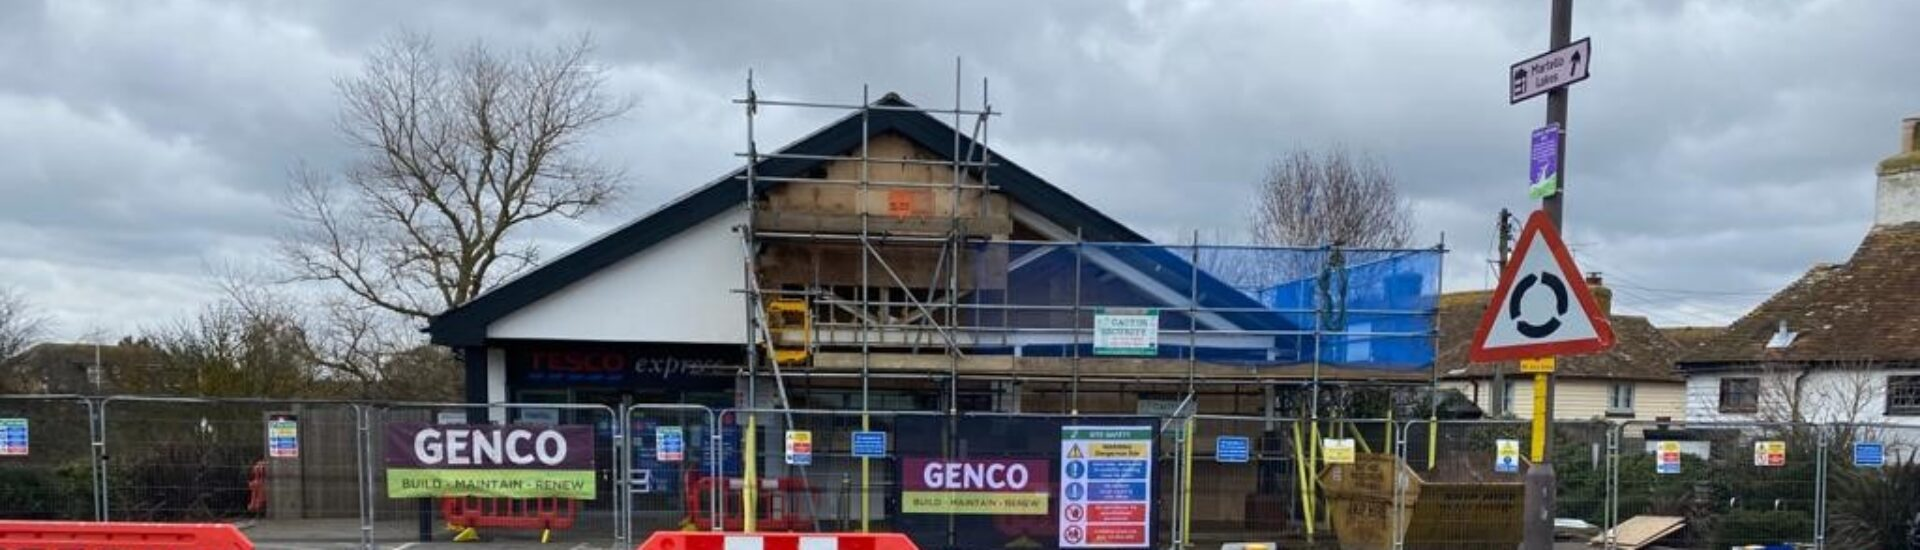 Genco Construction Services